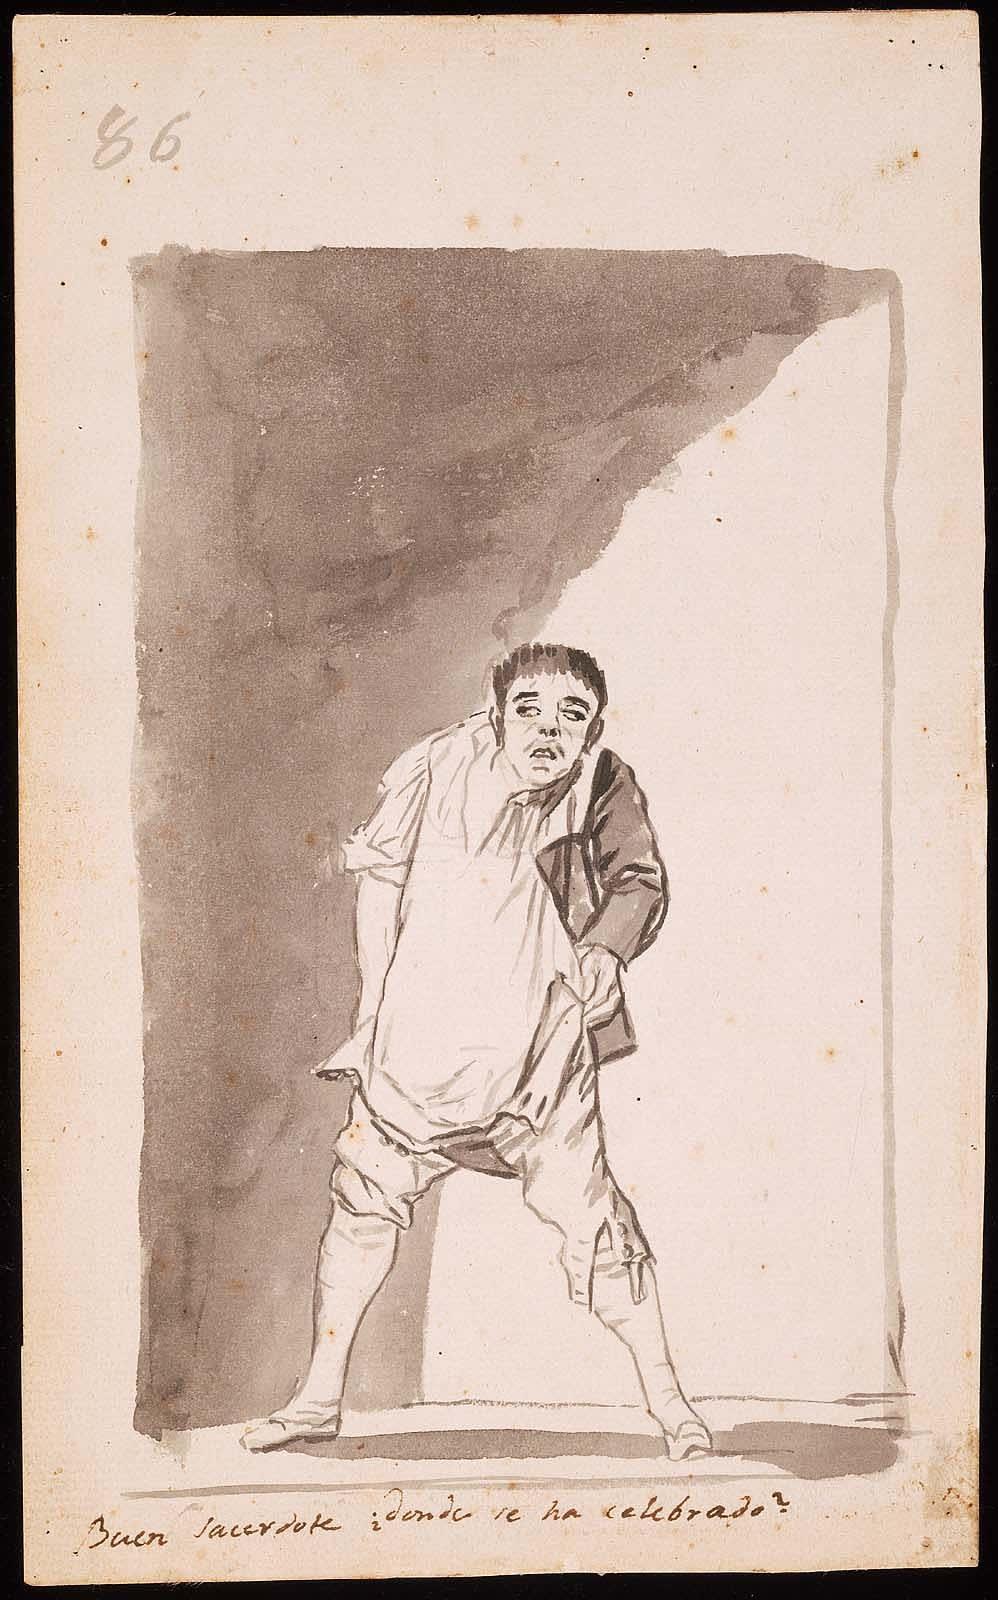 FRANCISCO GOYA, 'GOOD PRIEST, WHERE WAS IT CELEBRATED?' 1796 - 97 PRADO MUSEUM